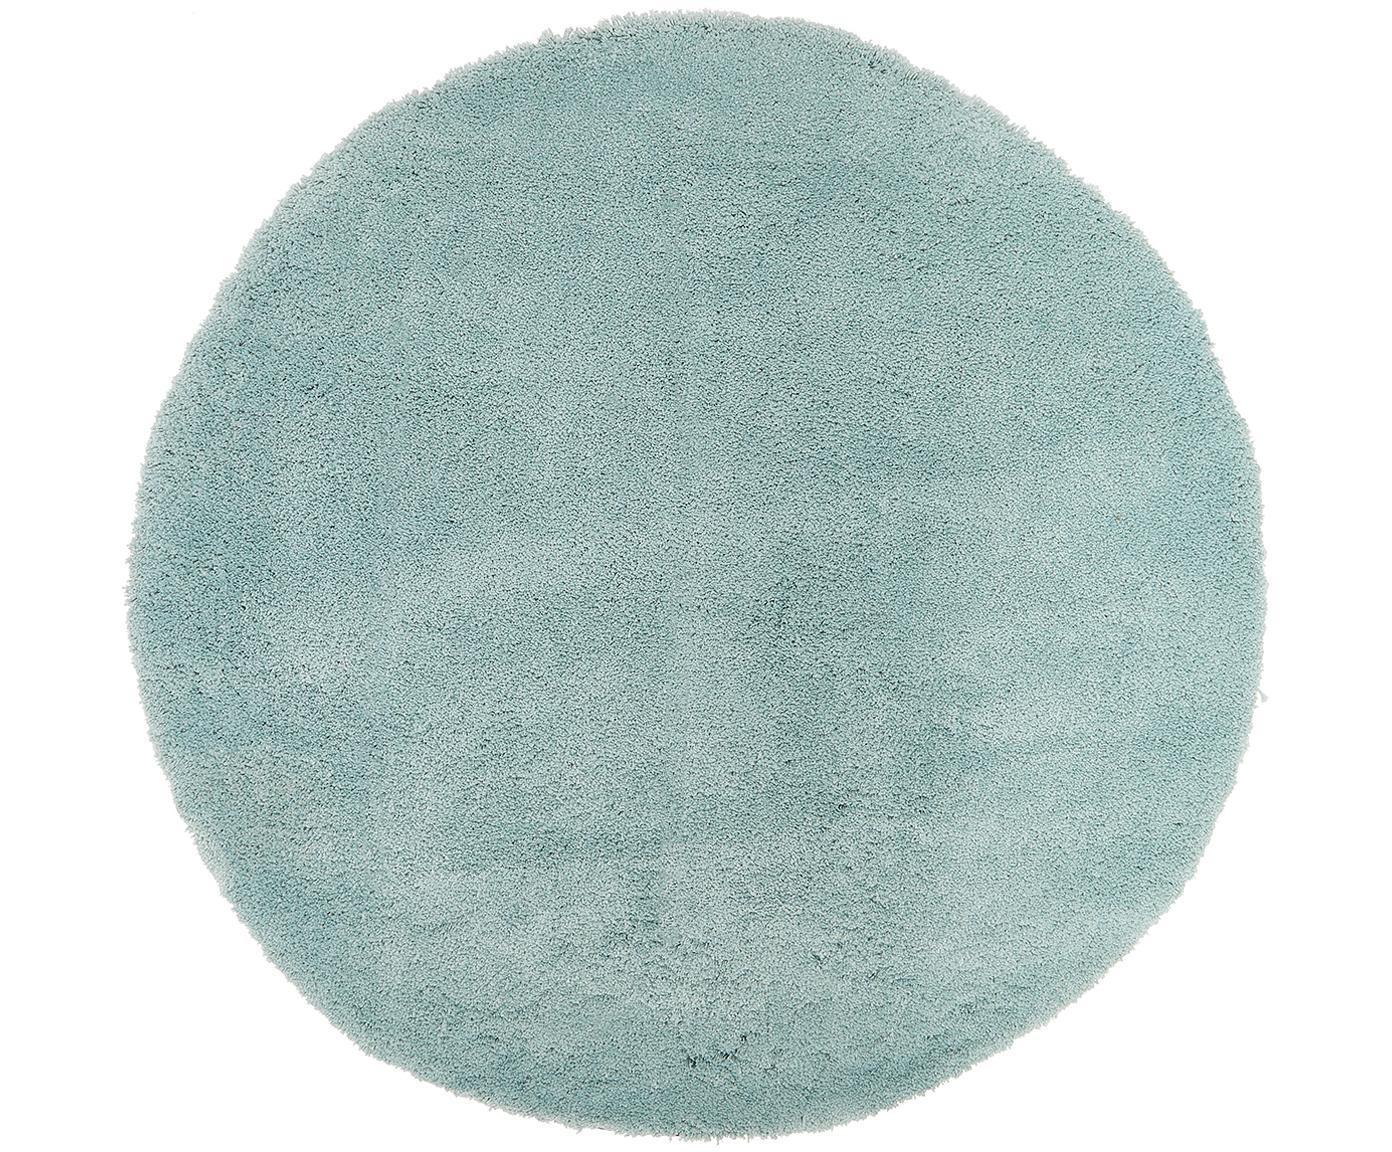 Tappeto peloso rotondo verde menta Leighton, Retro: 100% poliestere, Verde menta, Ø 120 cm